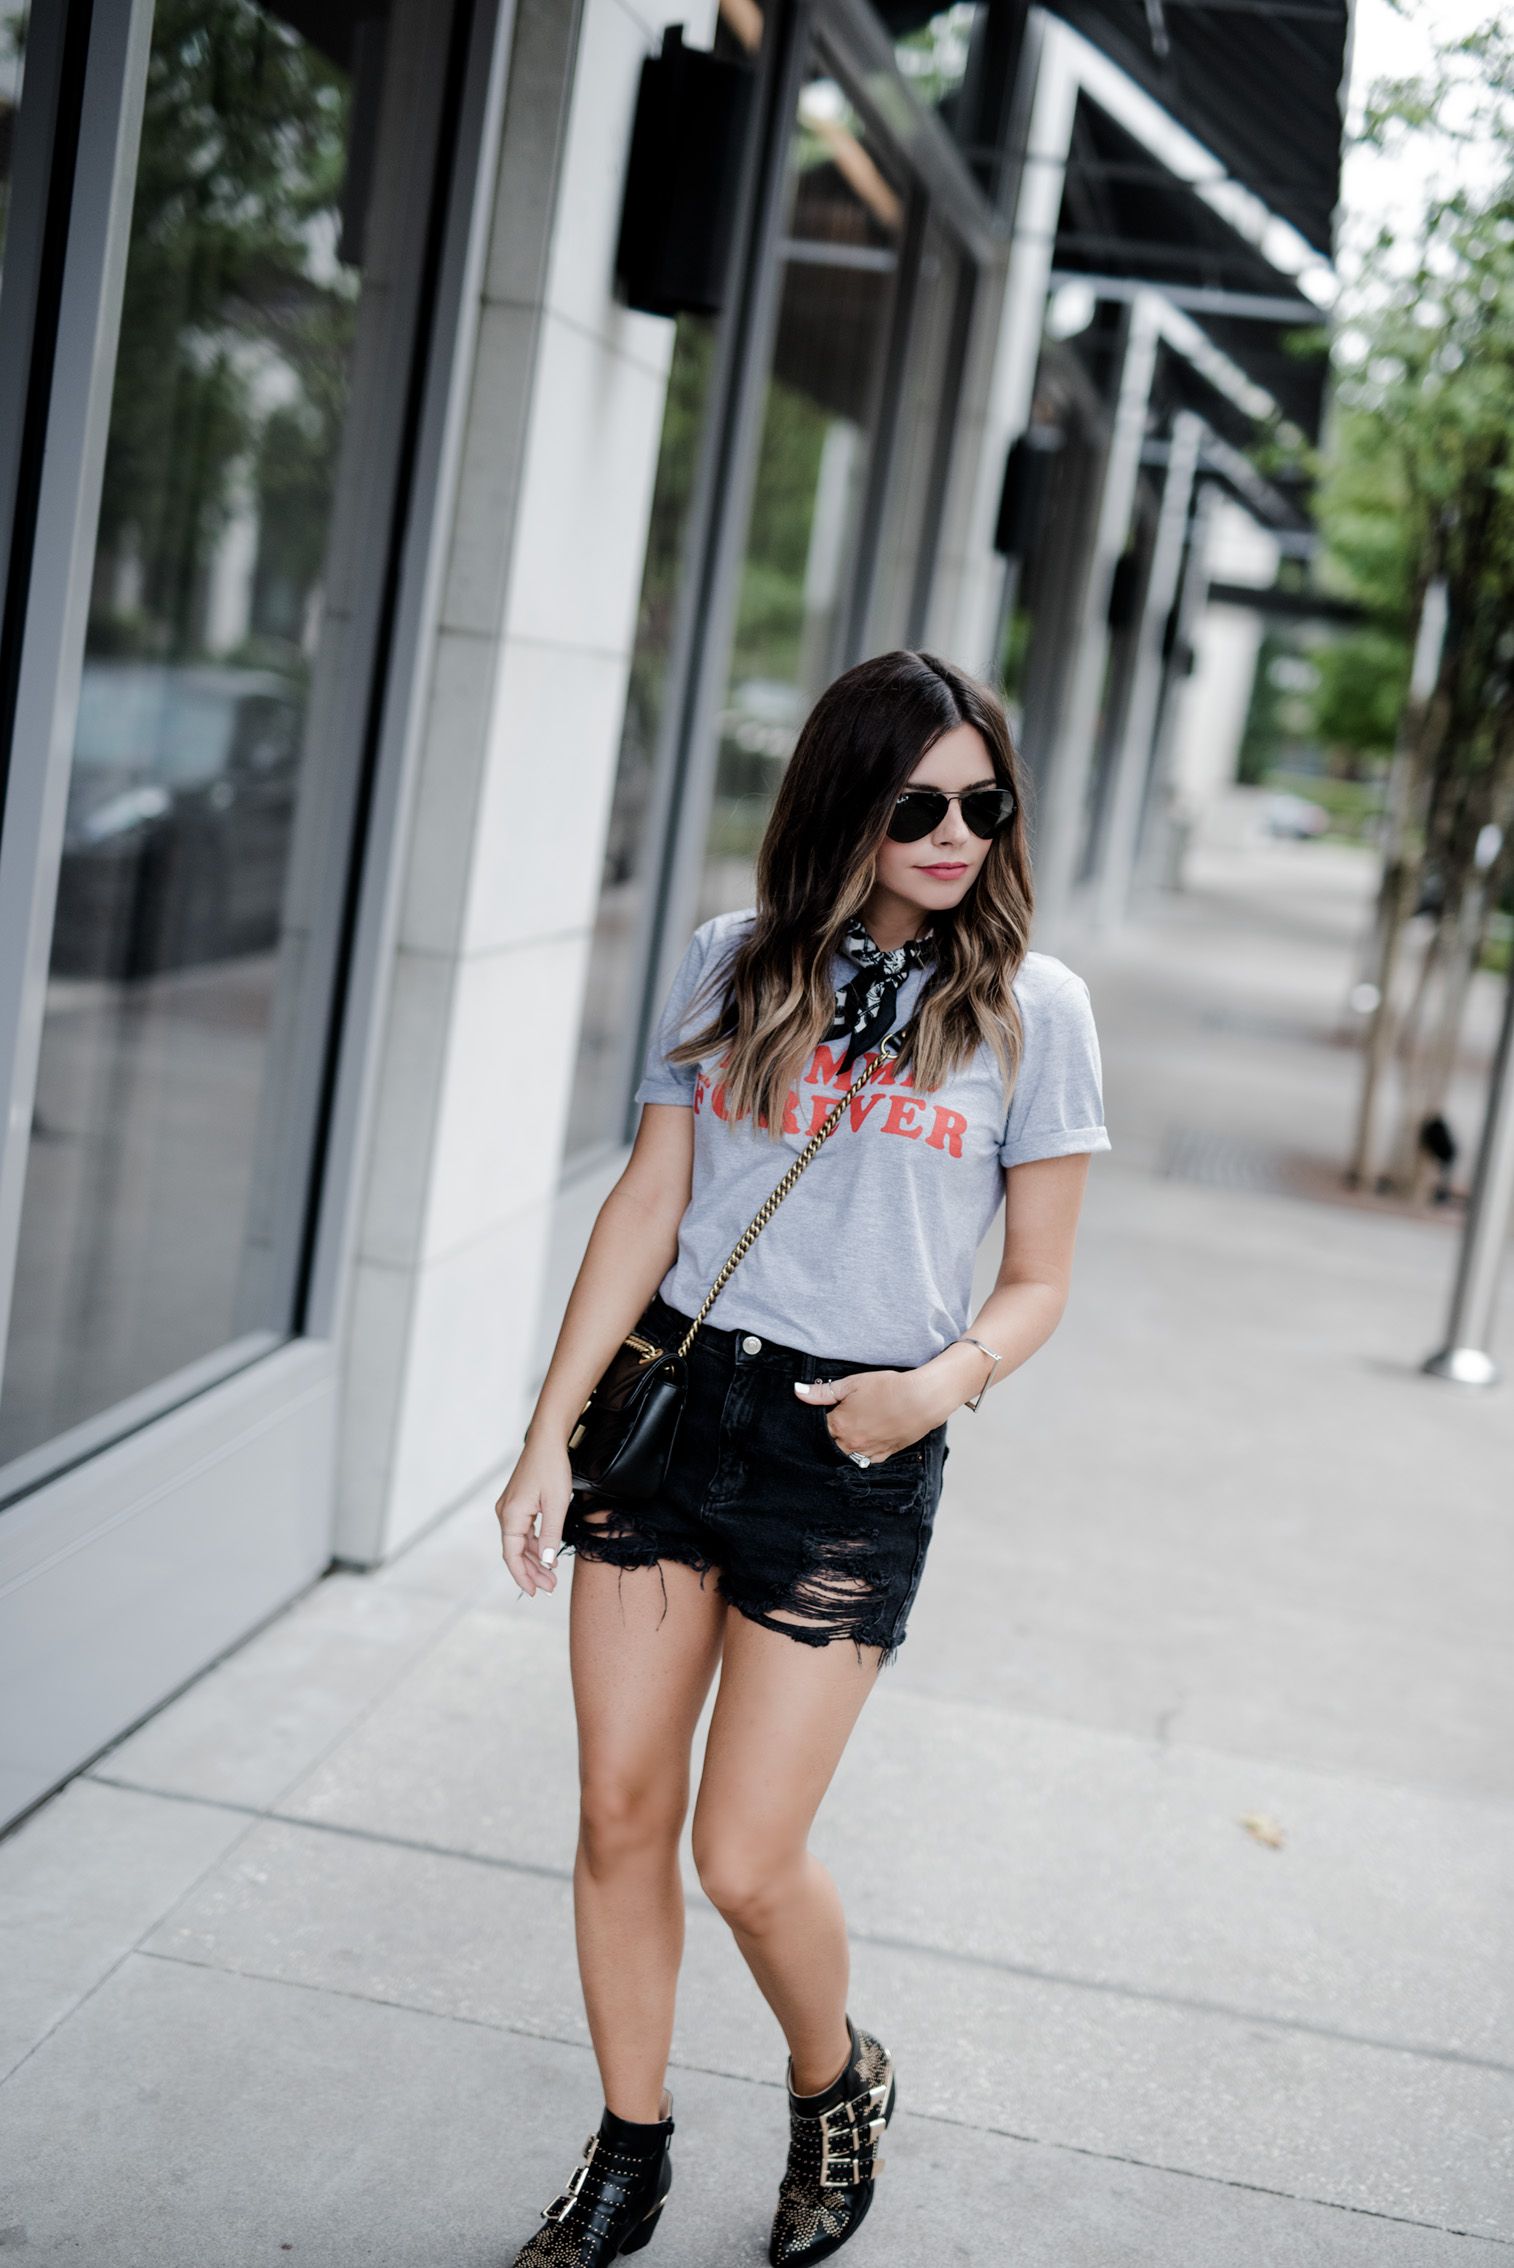 Tiffany Jais Houston fashion and lifestyle blogger | street style, graphic tee's, necktie scarf outfits,